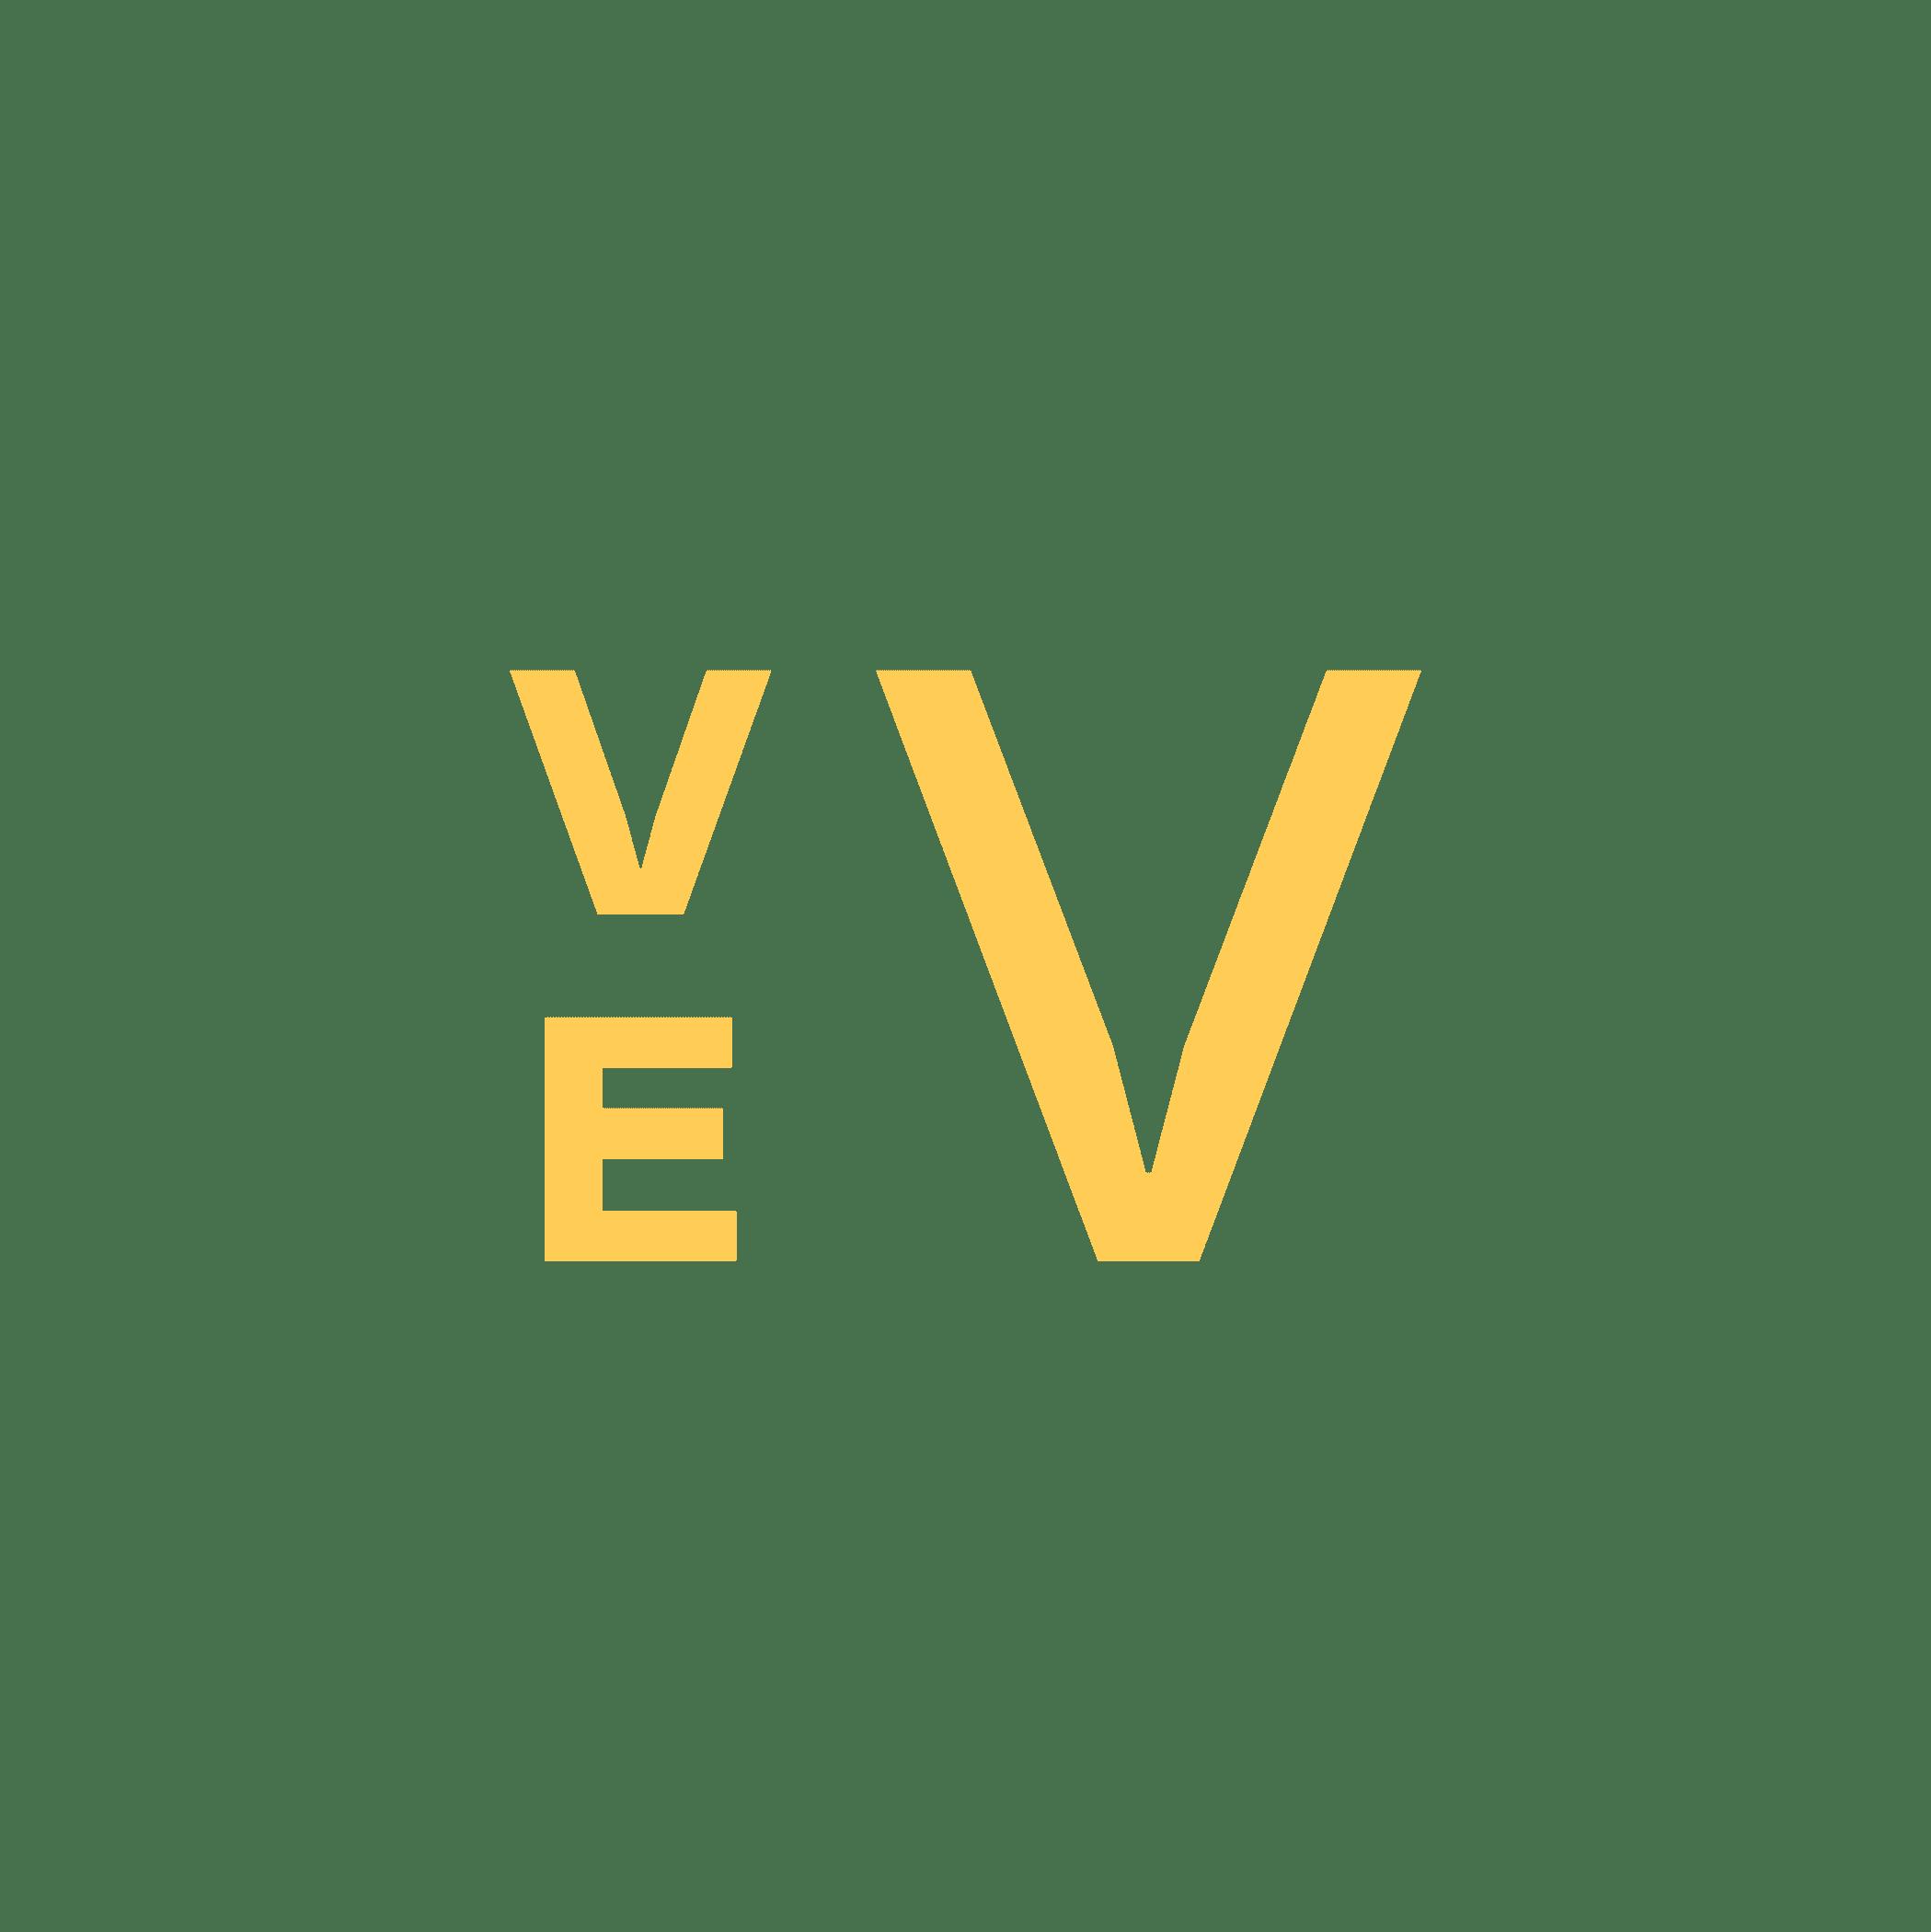 Logo_1x1_Yellow_RGB.png